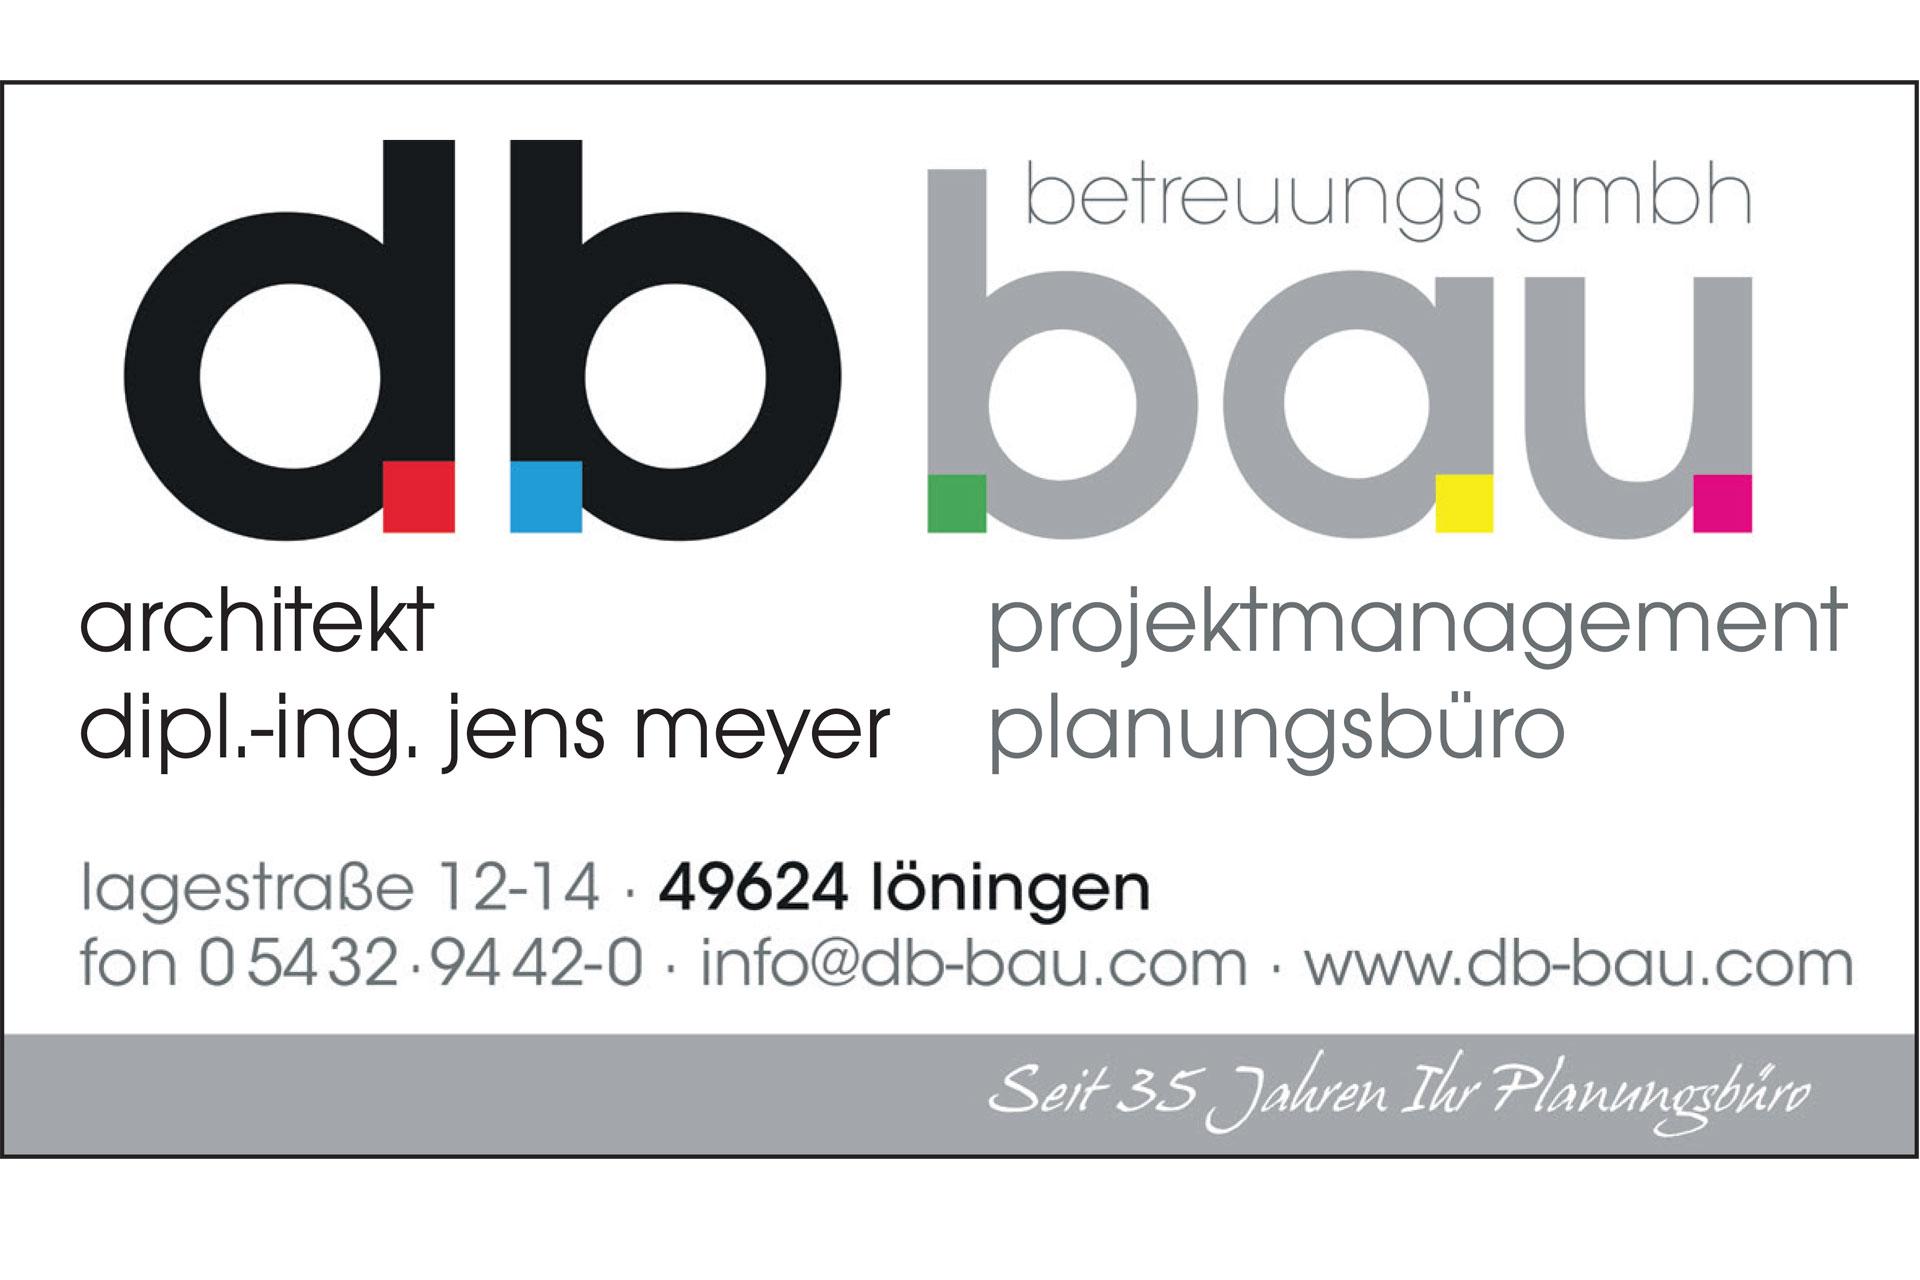 zum Bild: Logo db-bau-betreuungs GmbH.